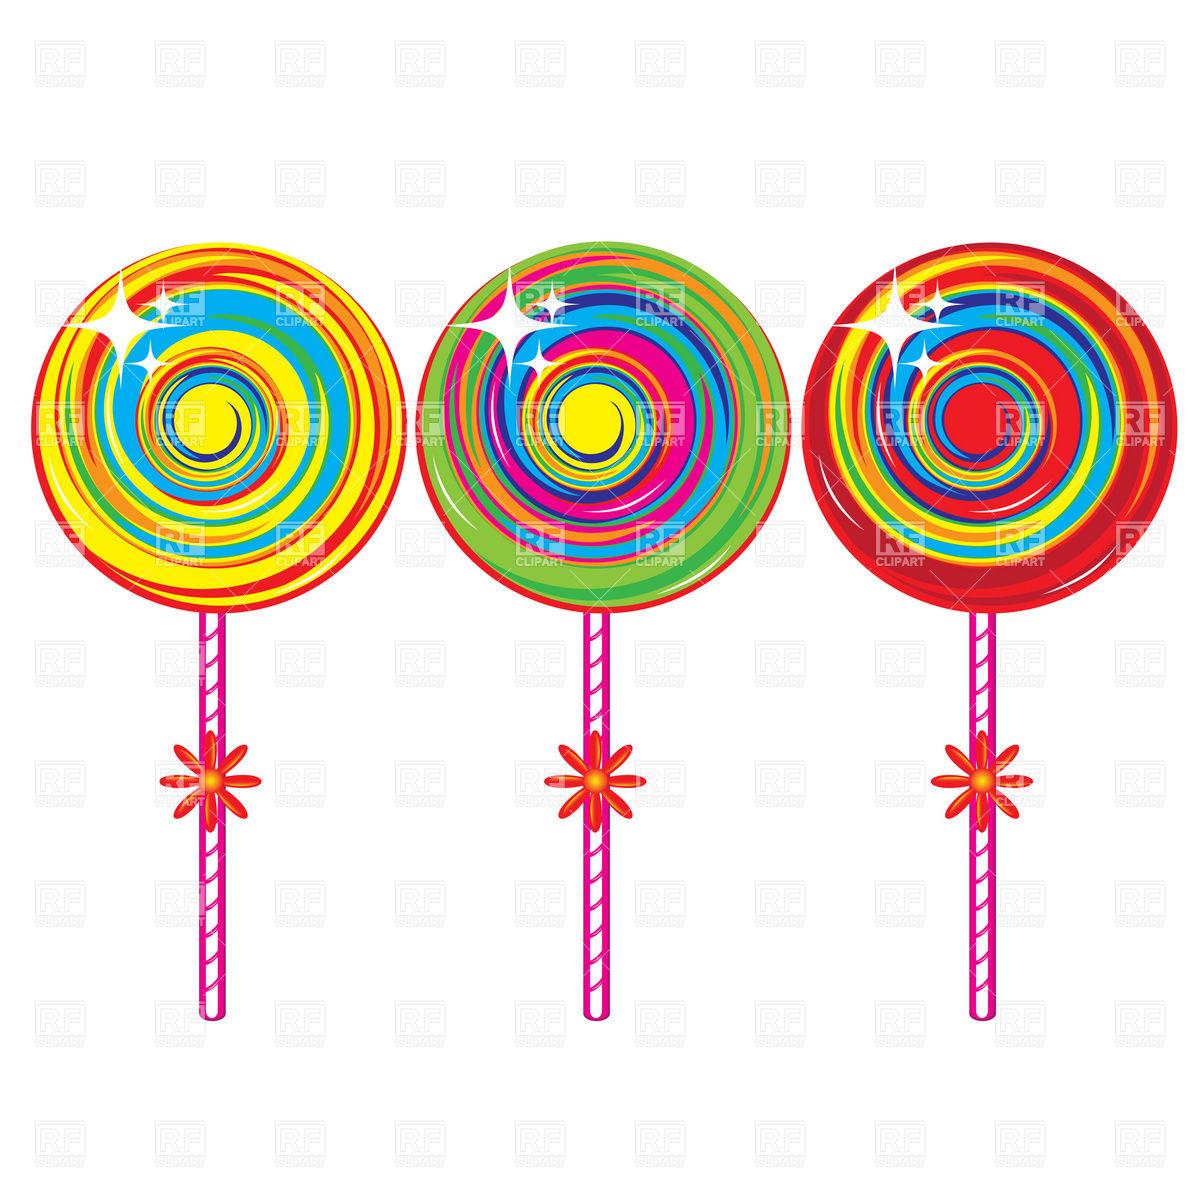 sucker-clipart-cartoon-lollipop-Download-Royalty-free-Vector-File-EPS ...